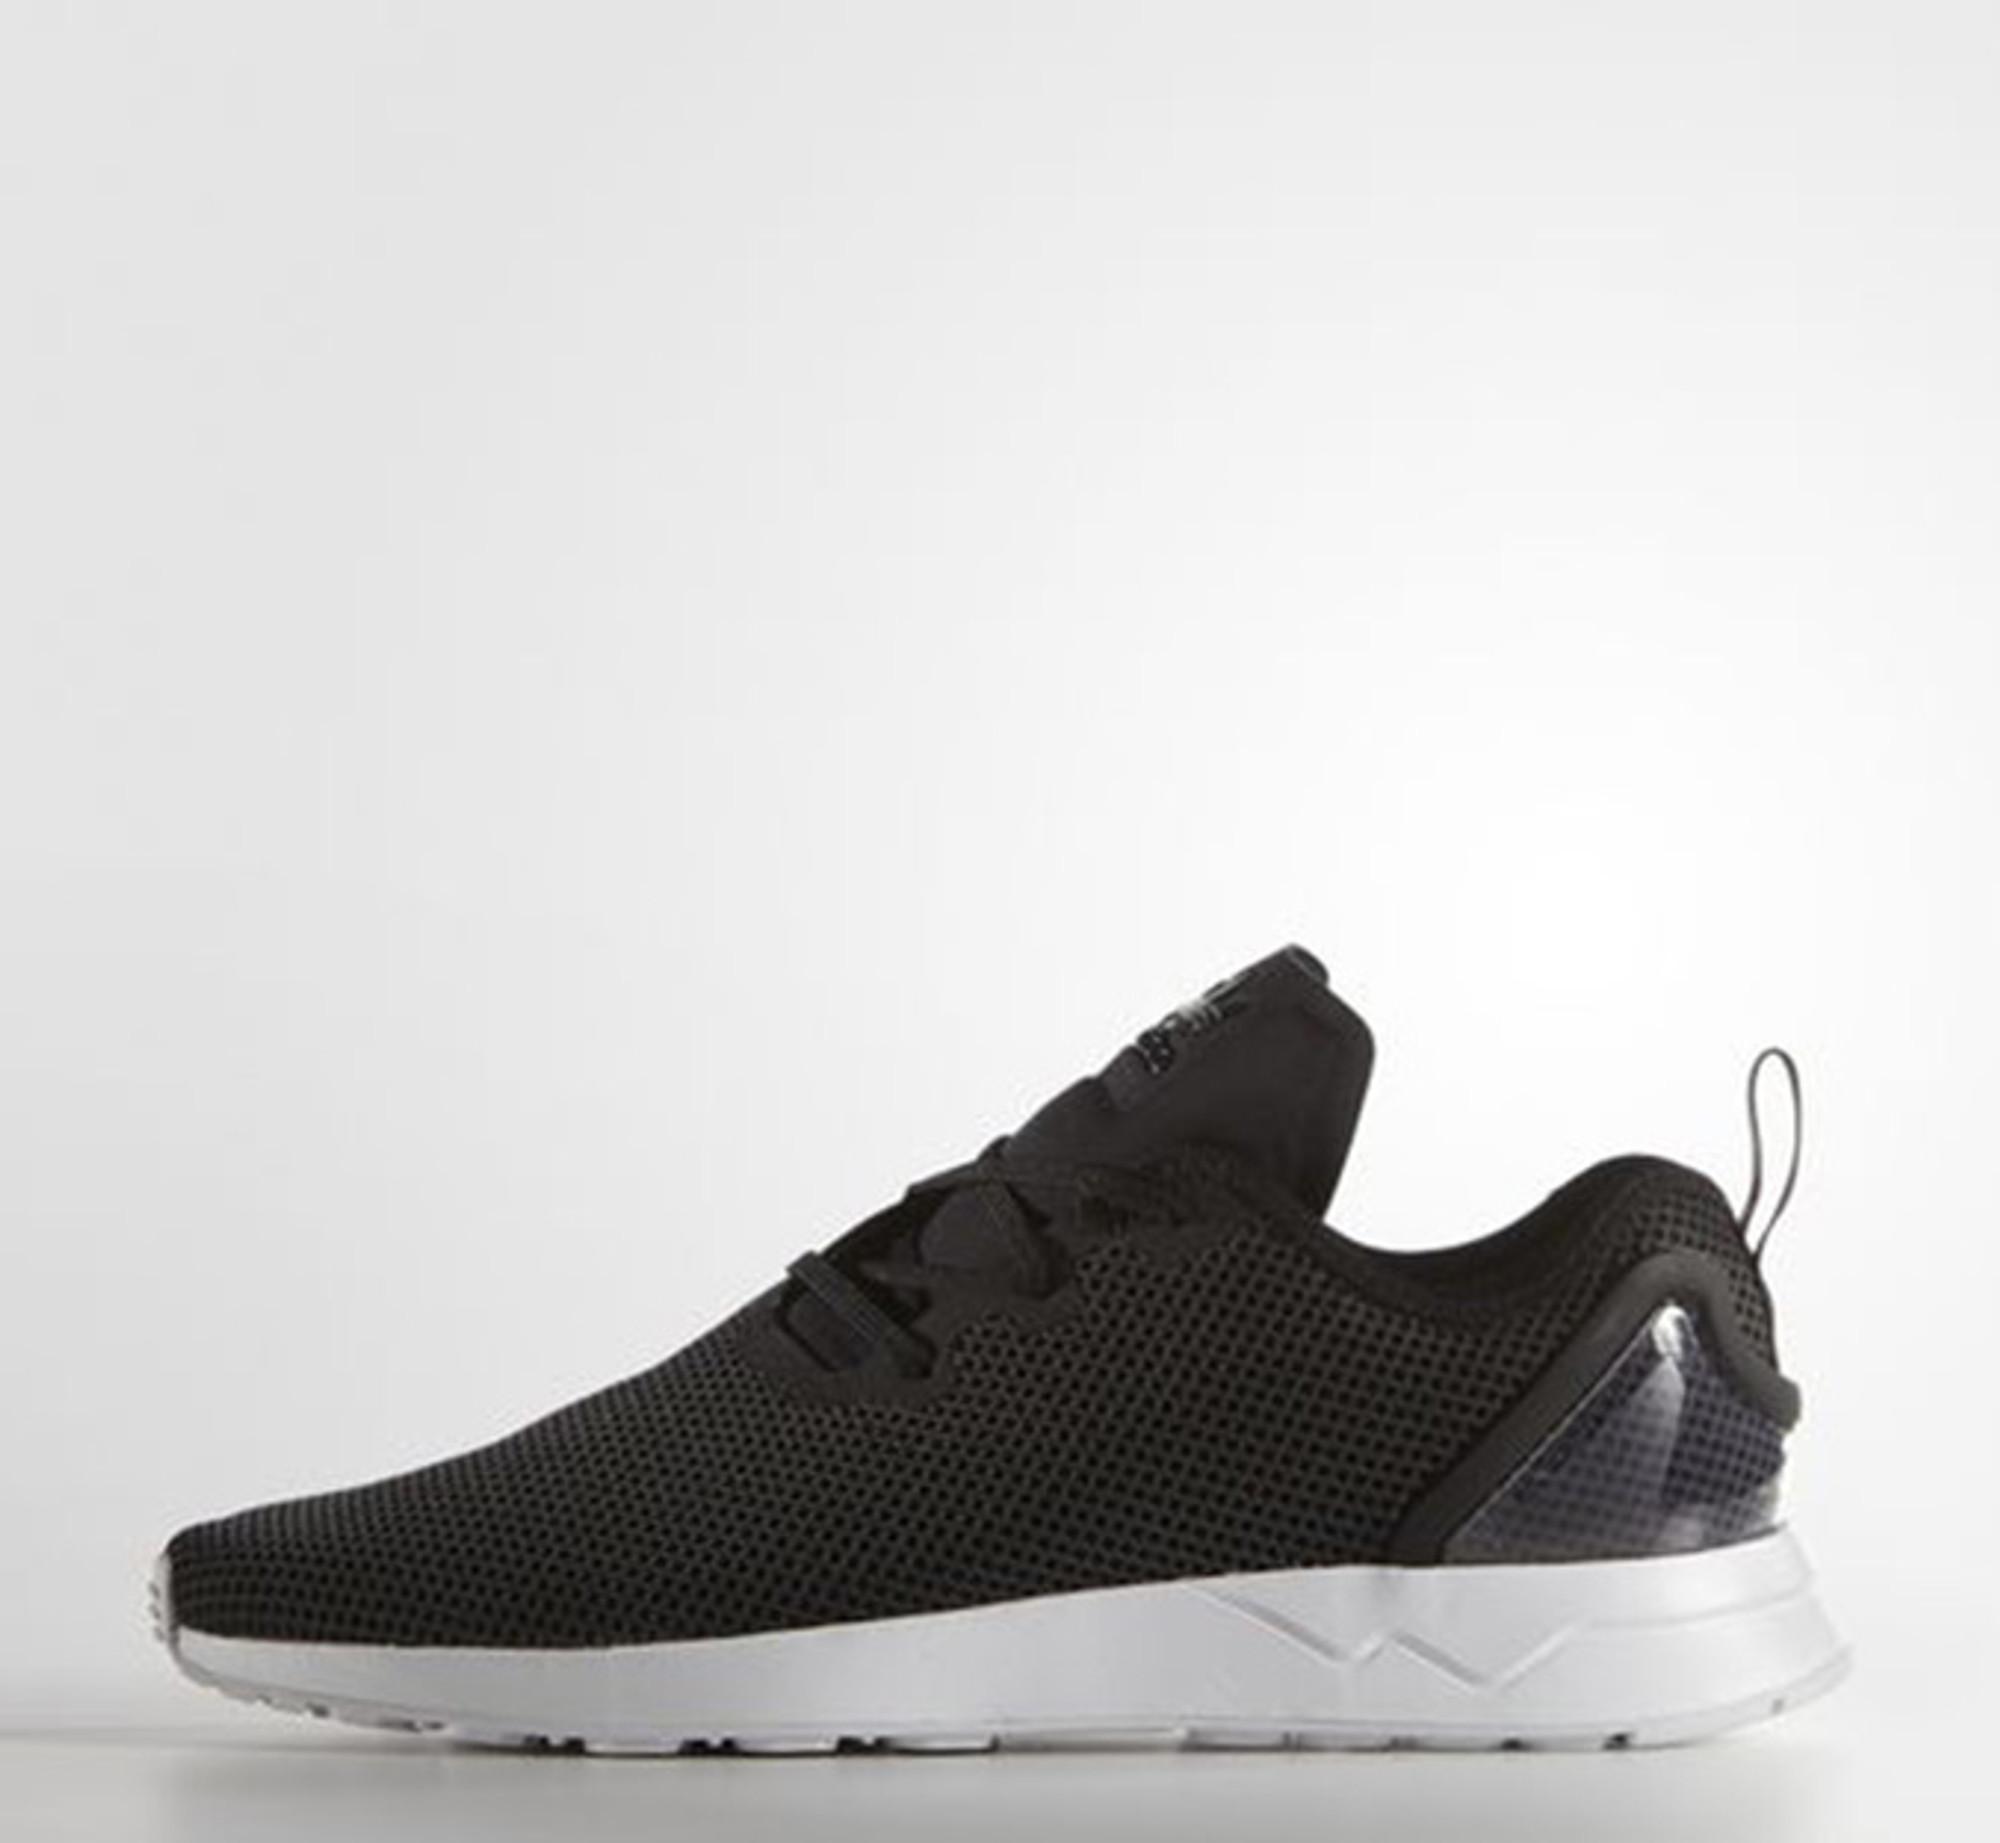 adidas zx flux s